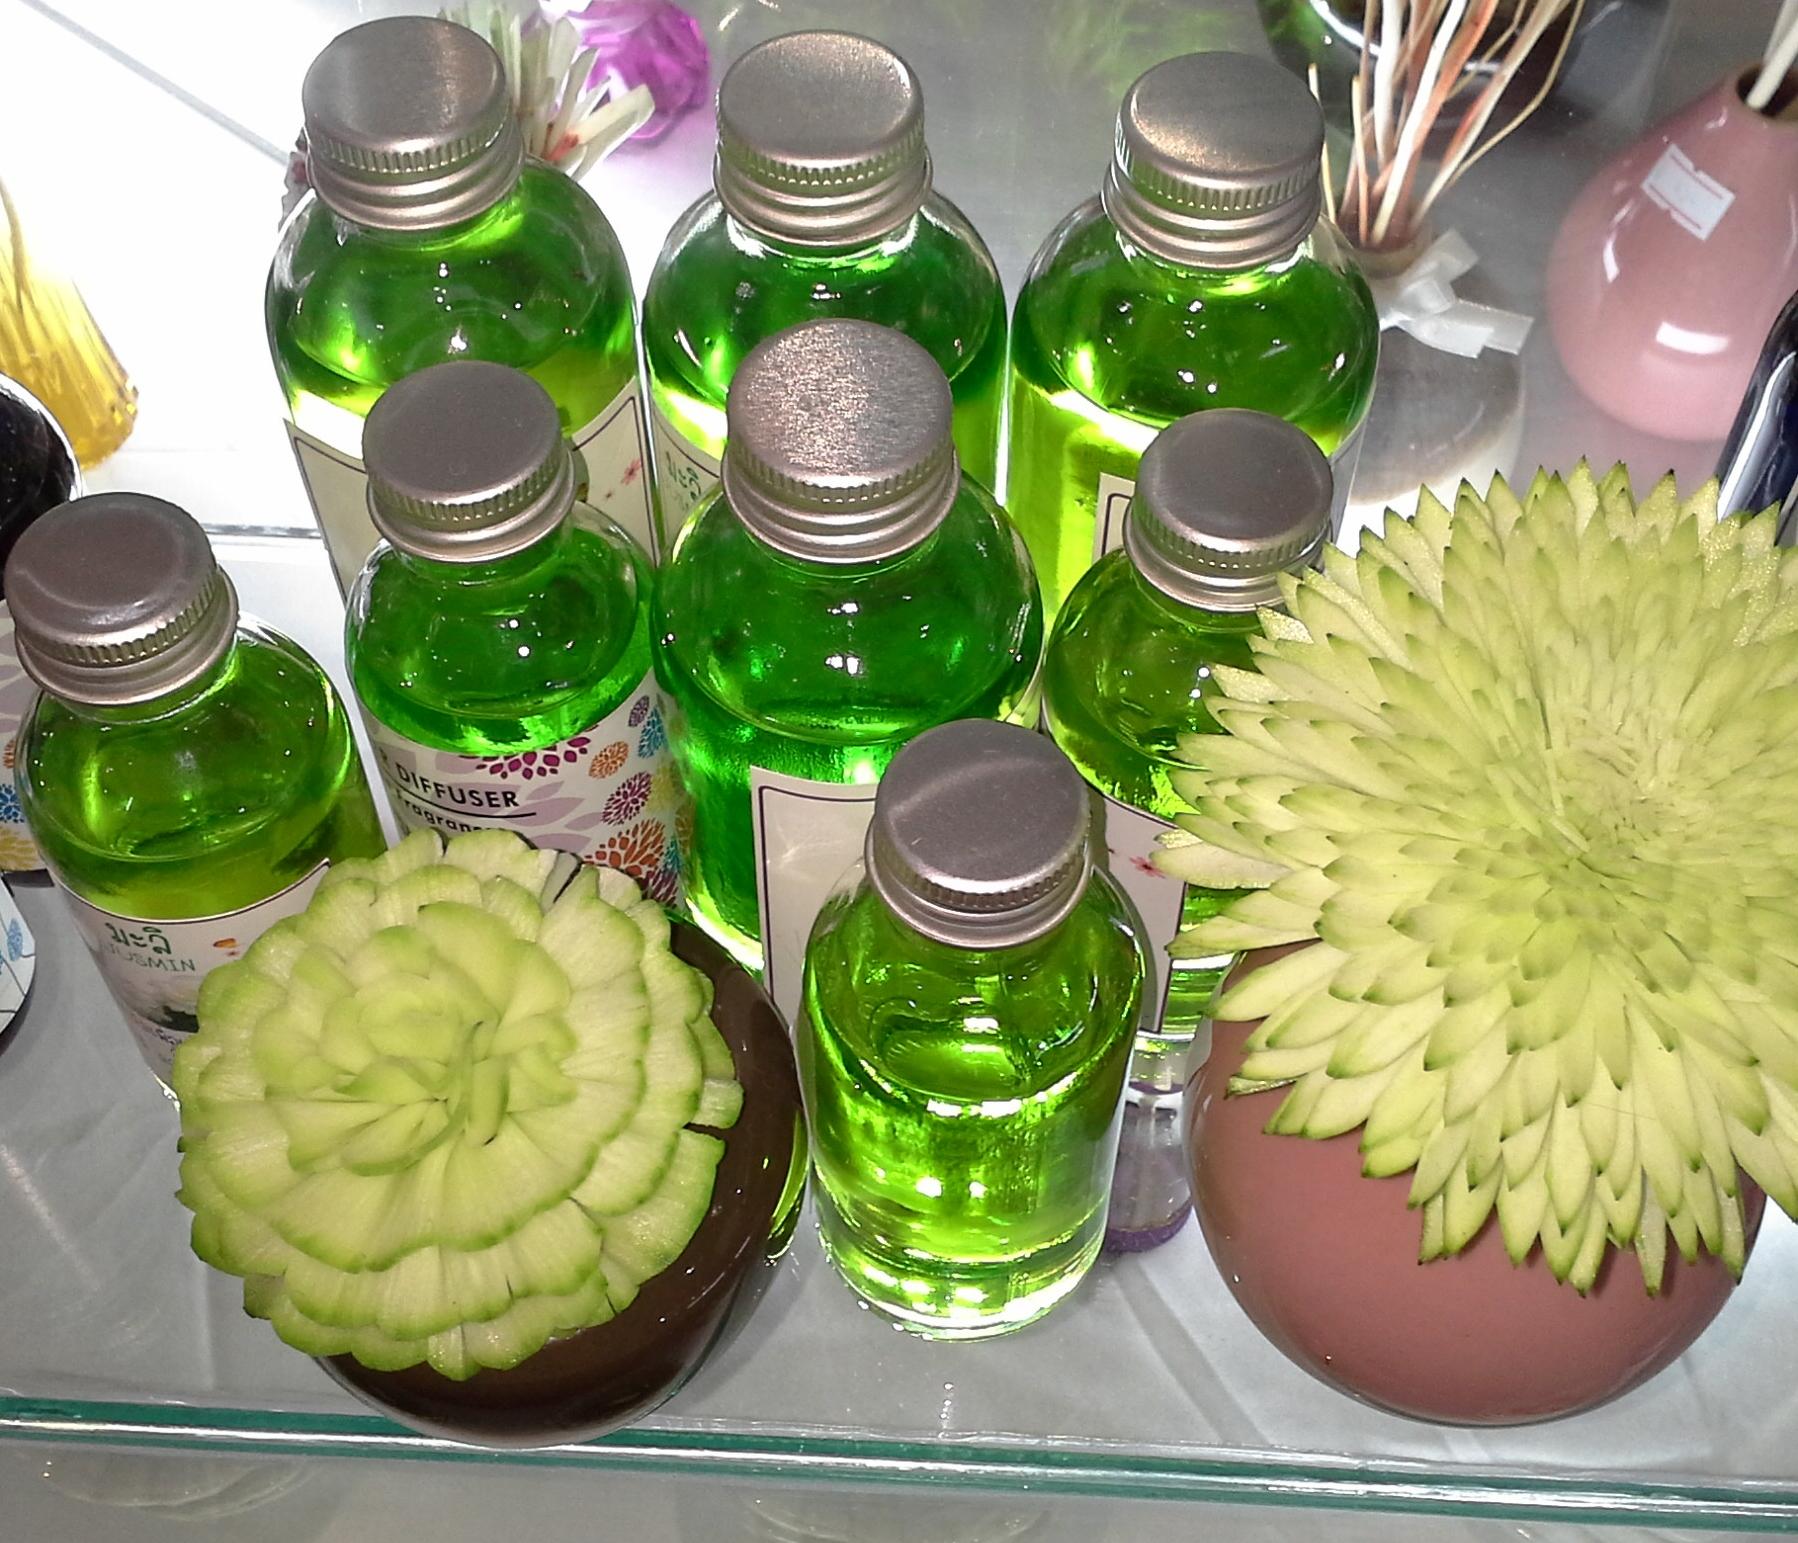 Green diffuser